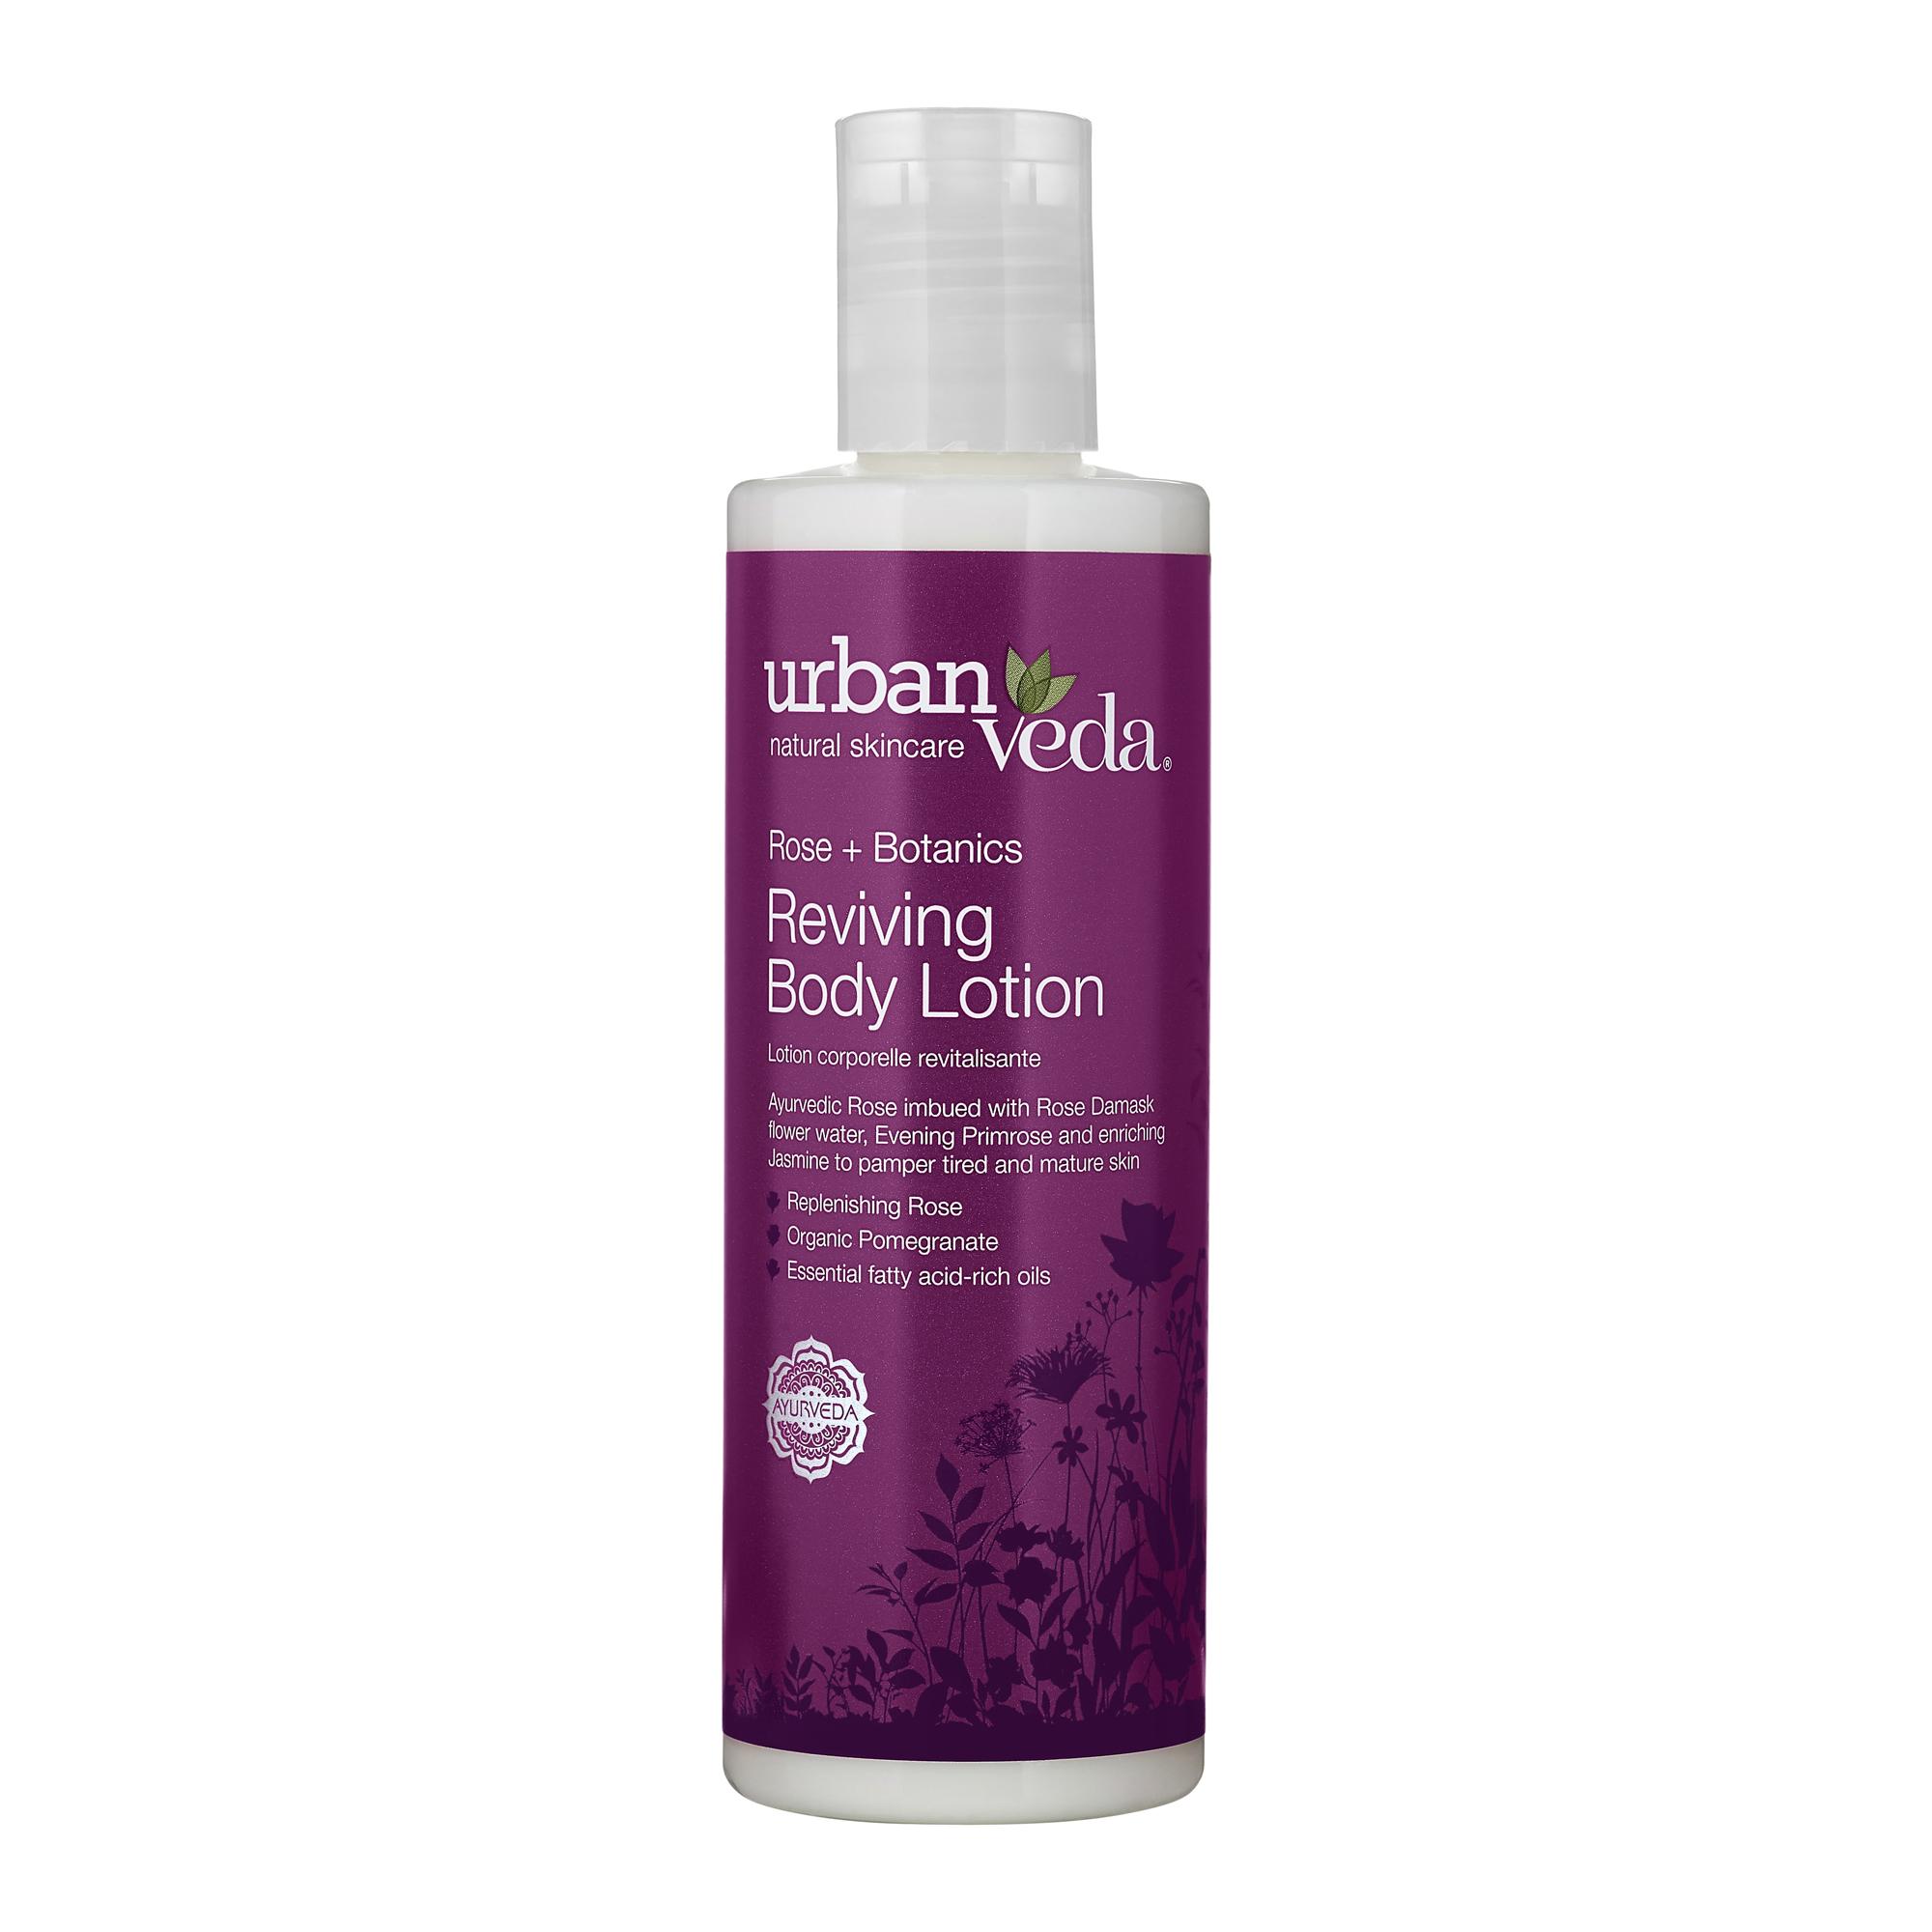 Urban Veda | Urban Veda Reviving Rose Body Lotion, 250ml